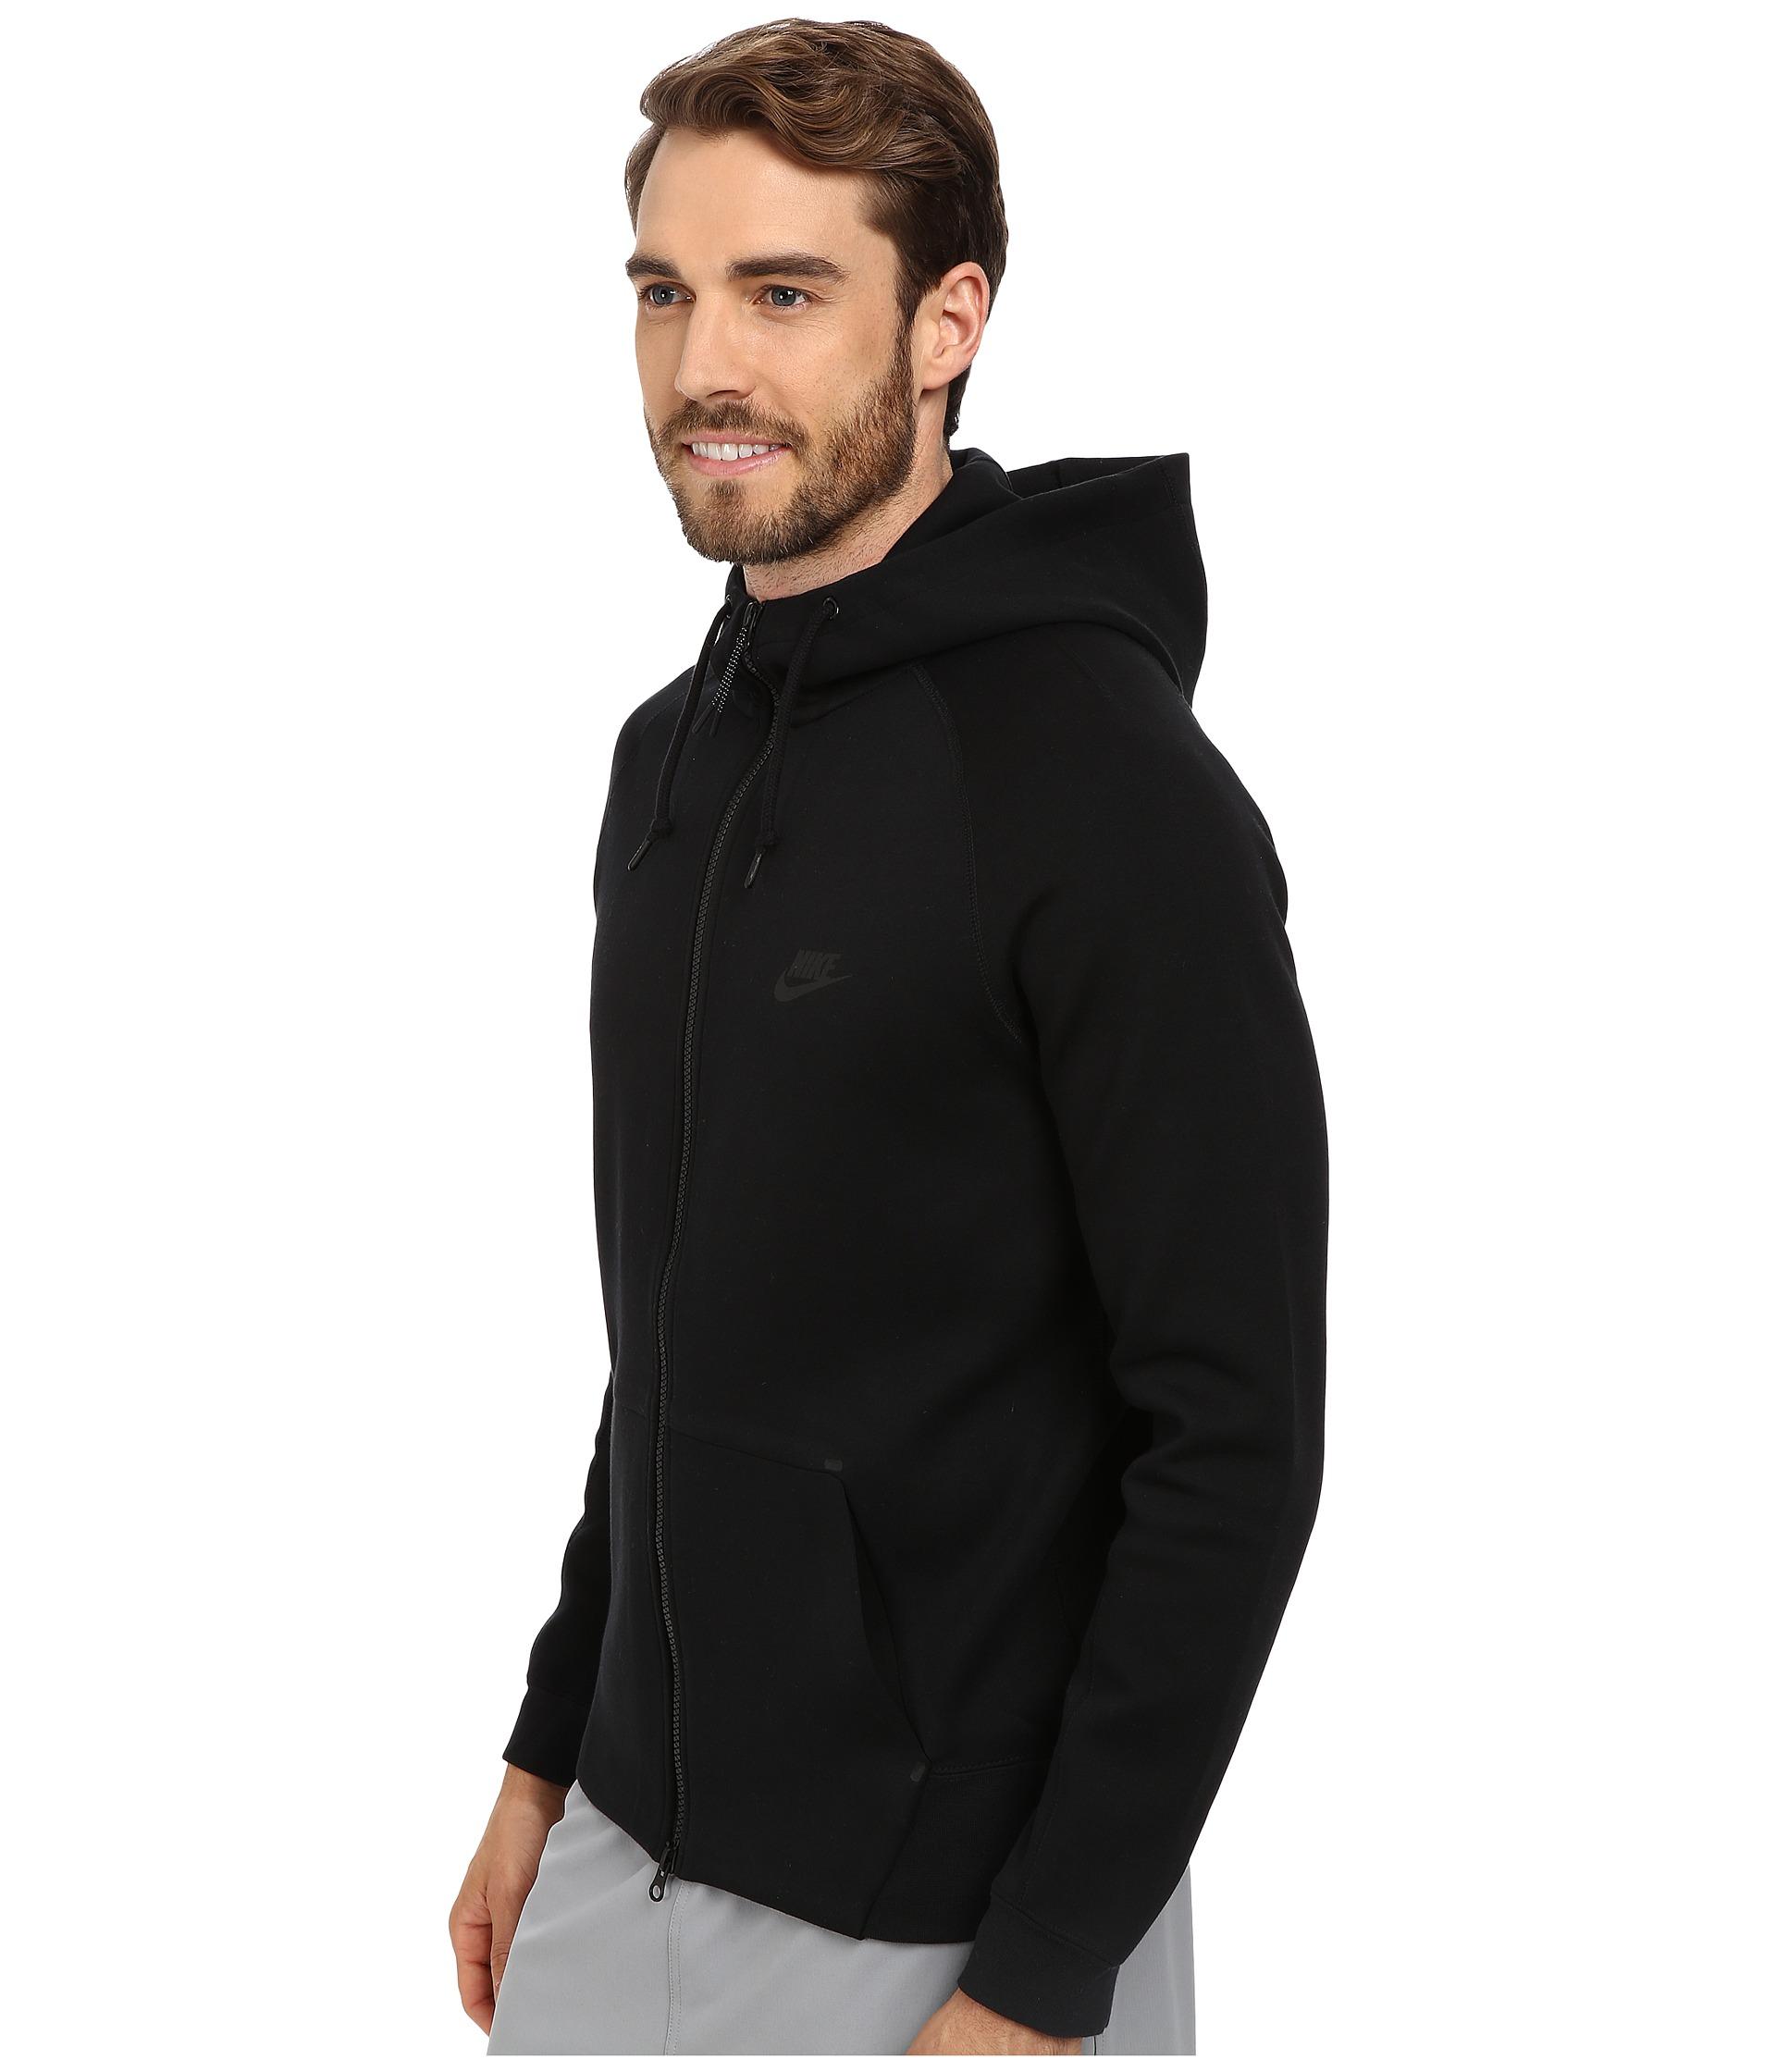 nike tech fleece aw77 1 0 full zip hoodie. Black Bedroom Furniture Sets. Home Design Ideas